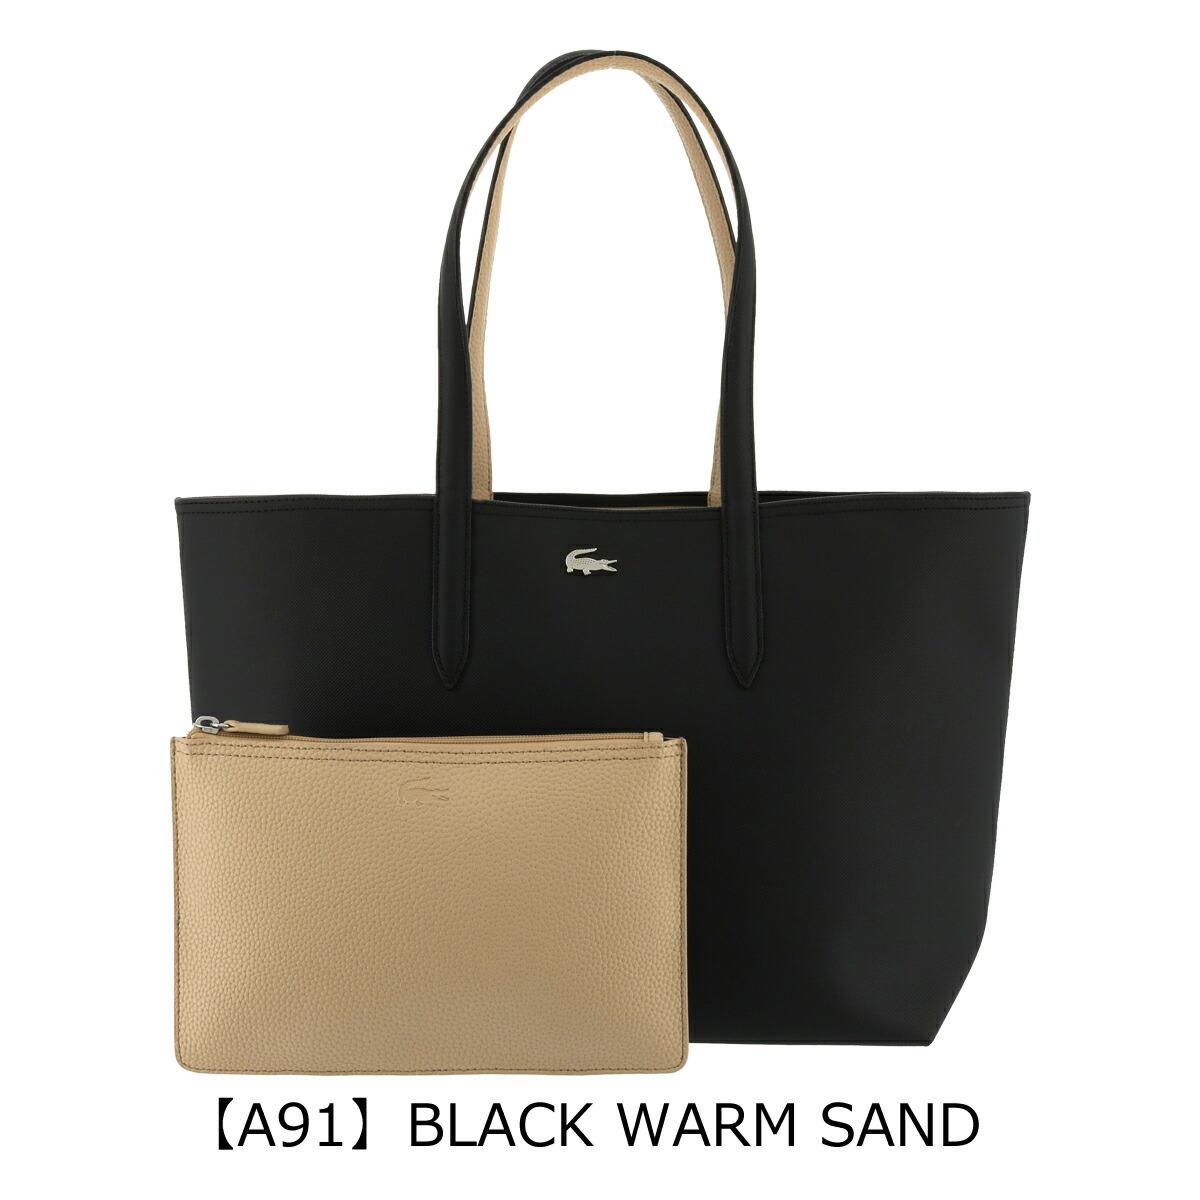 【A91】BLACK WARM SAND